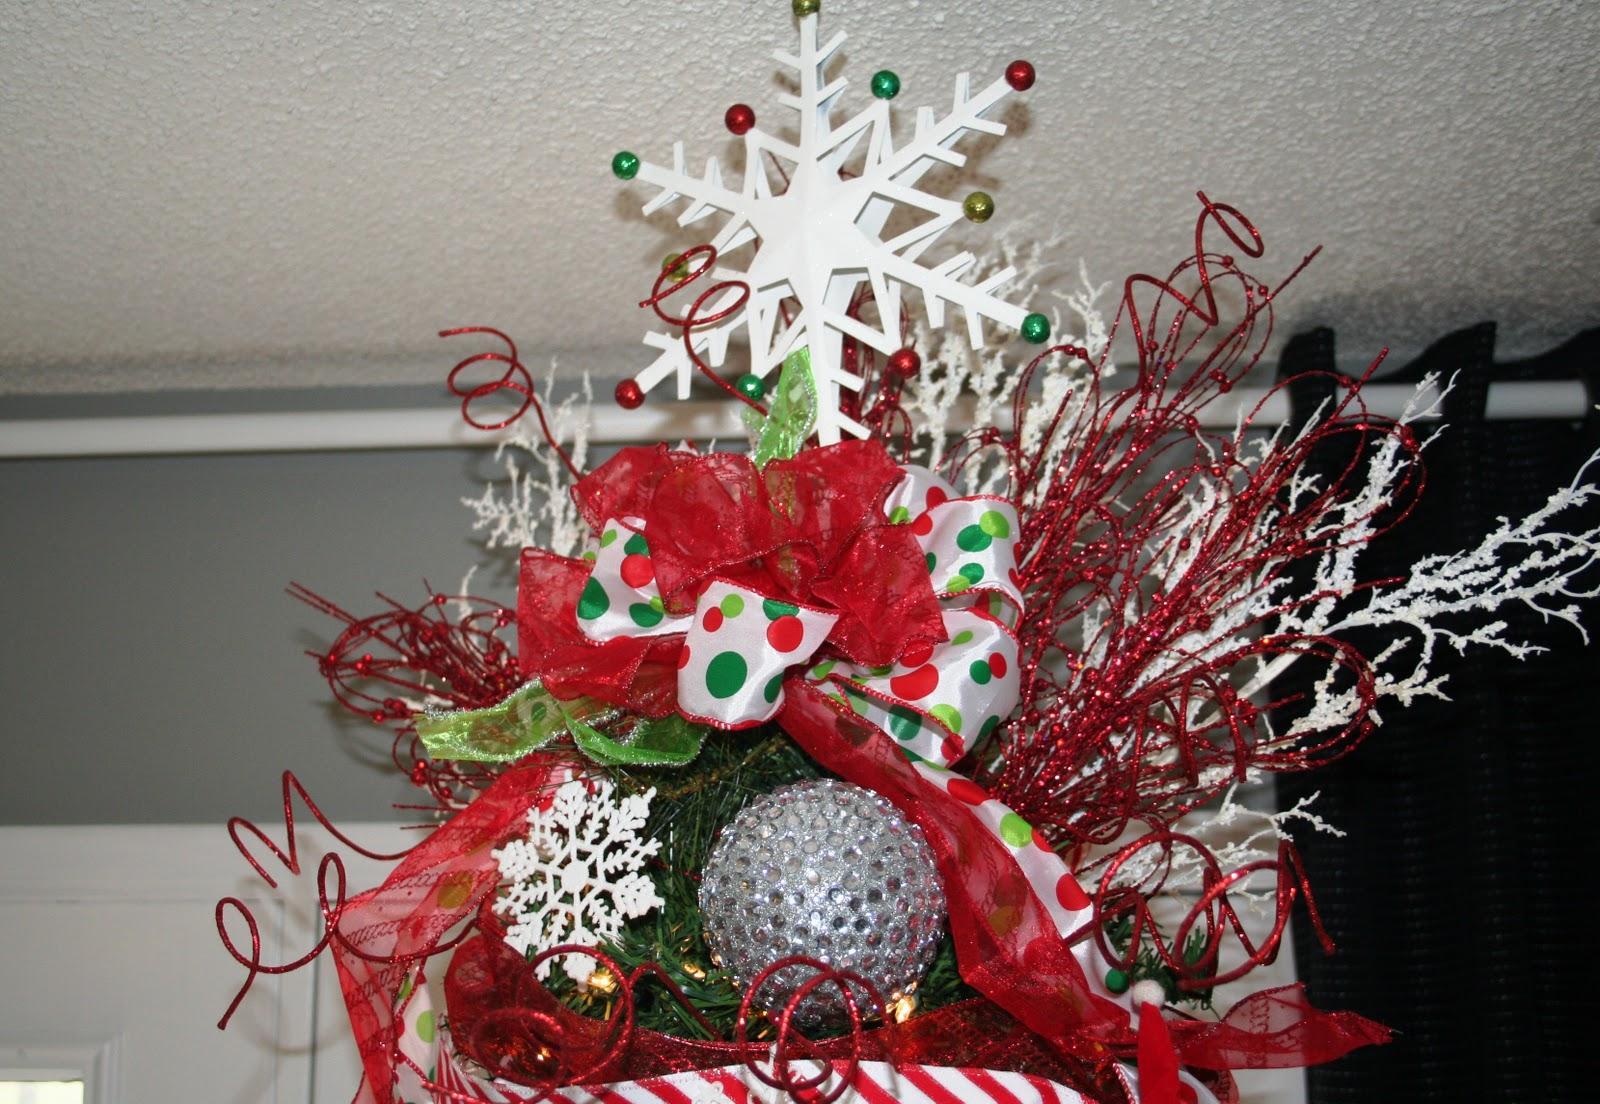 Cheap Filing Cabinets: Hobby Lobby Christmas Trees